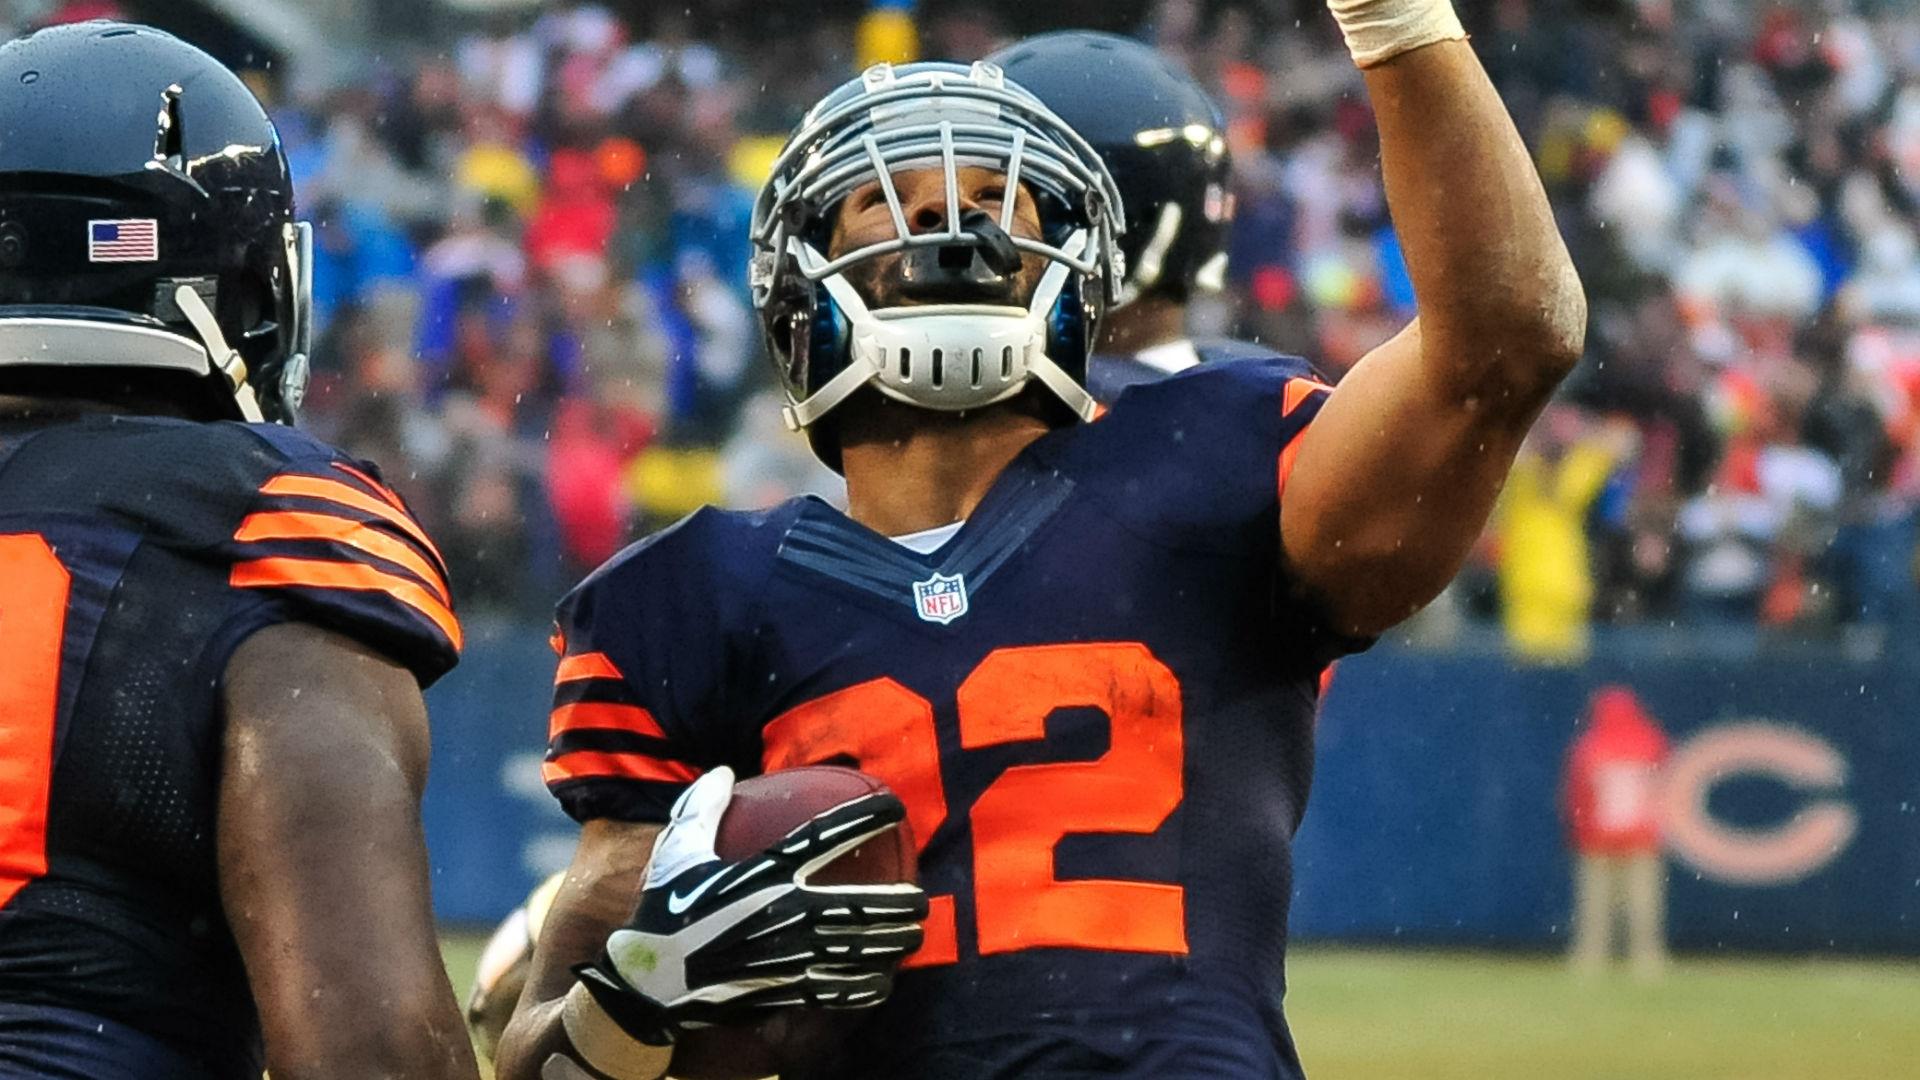 Bears vs. Lions props - Detroit hosts Bears as D seeks redemption